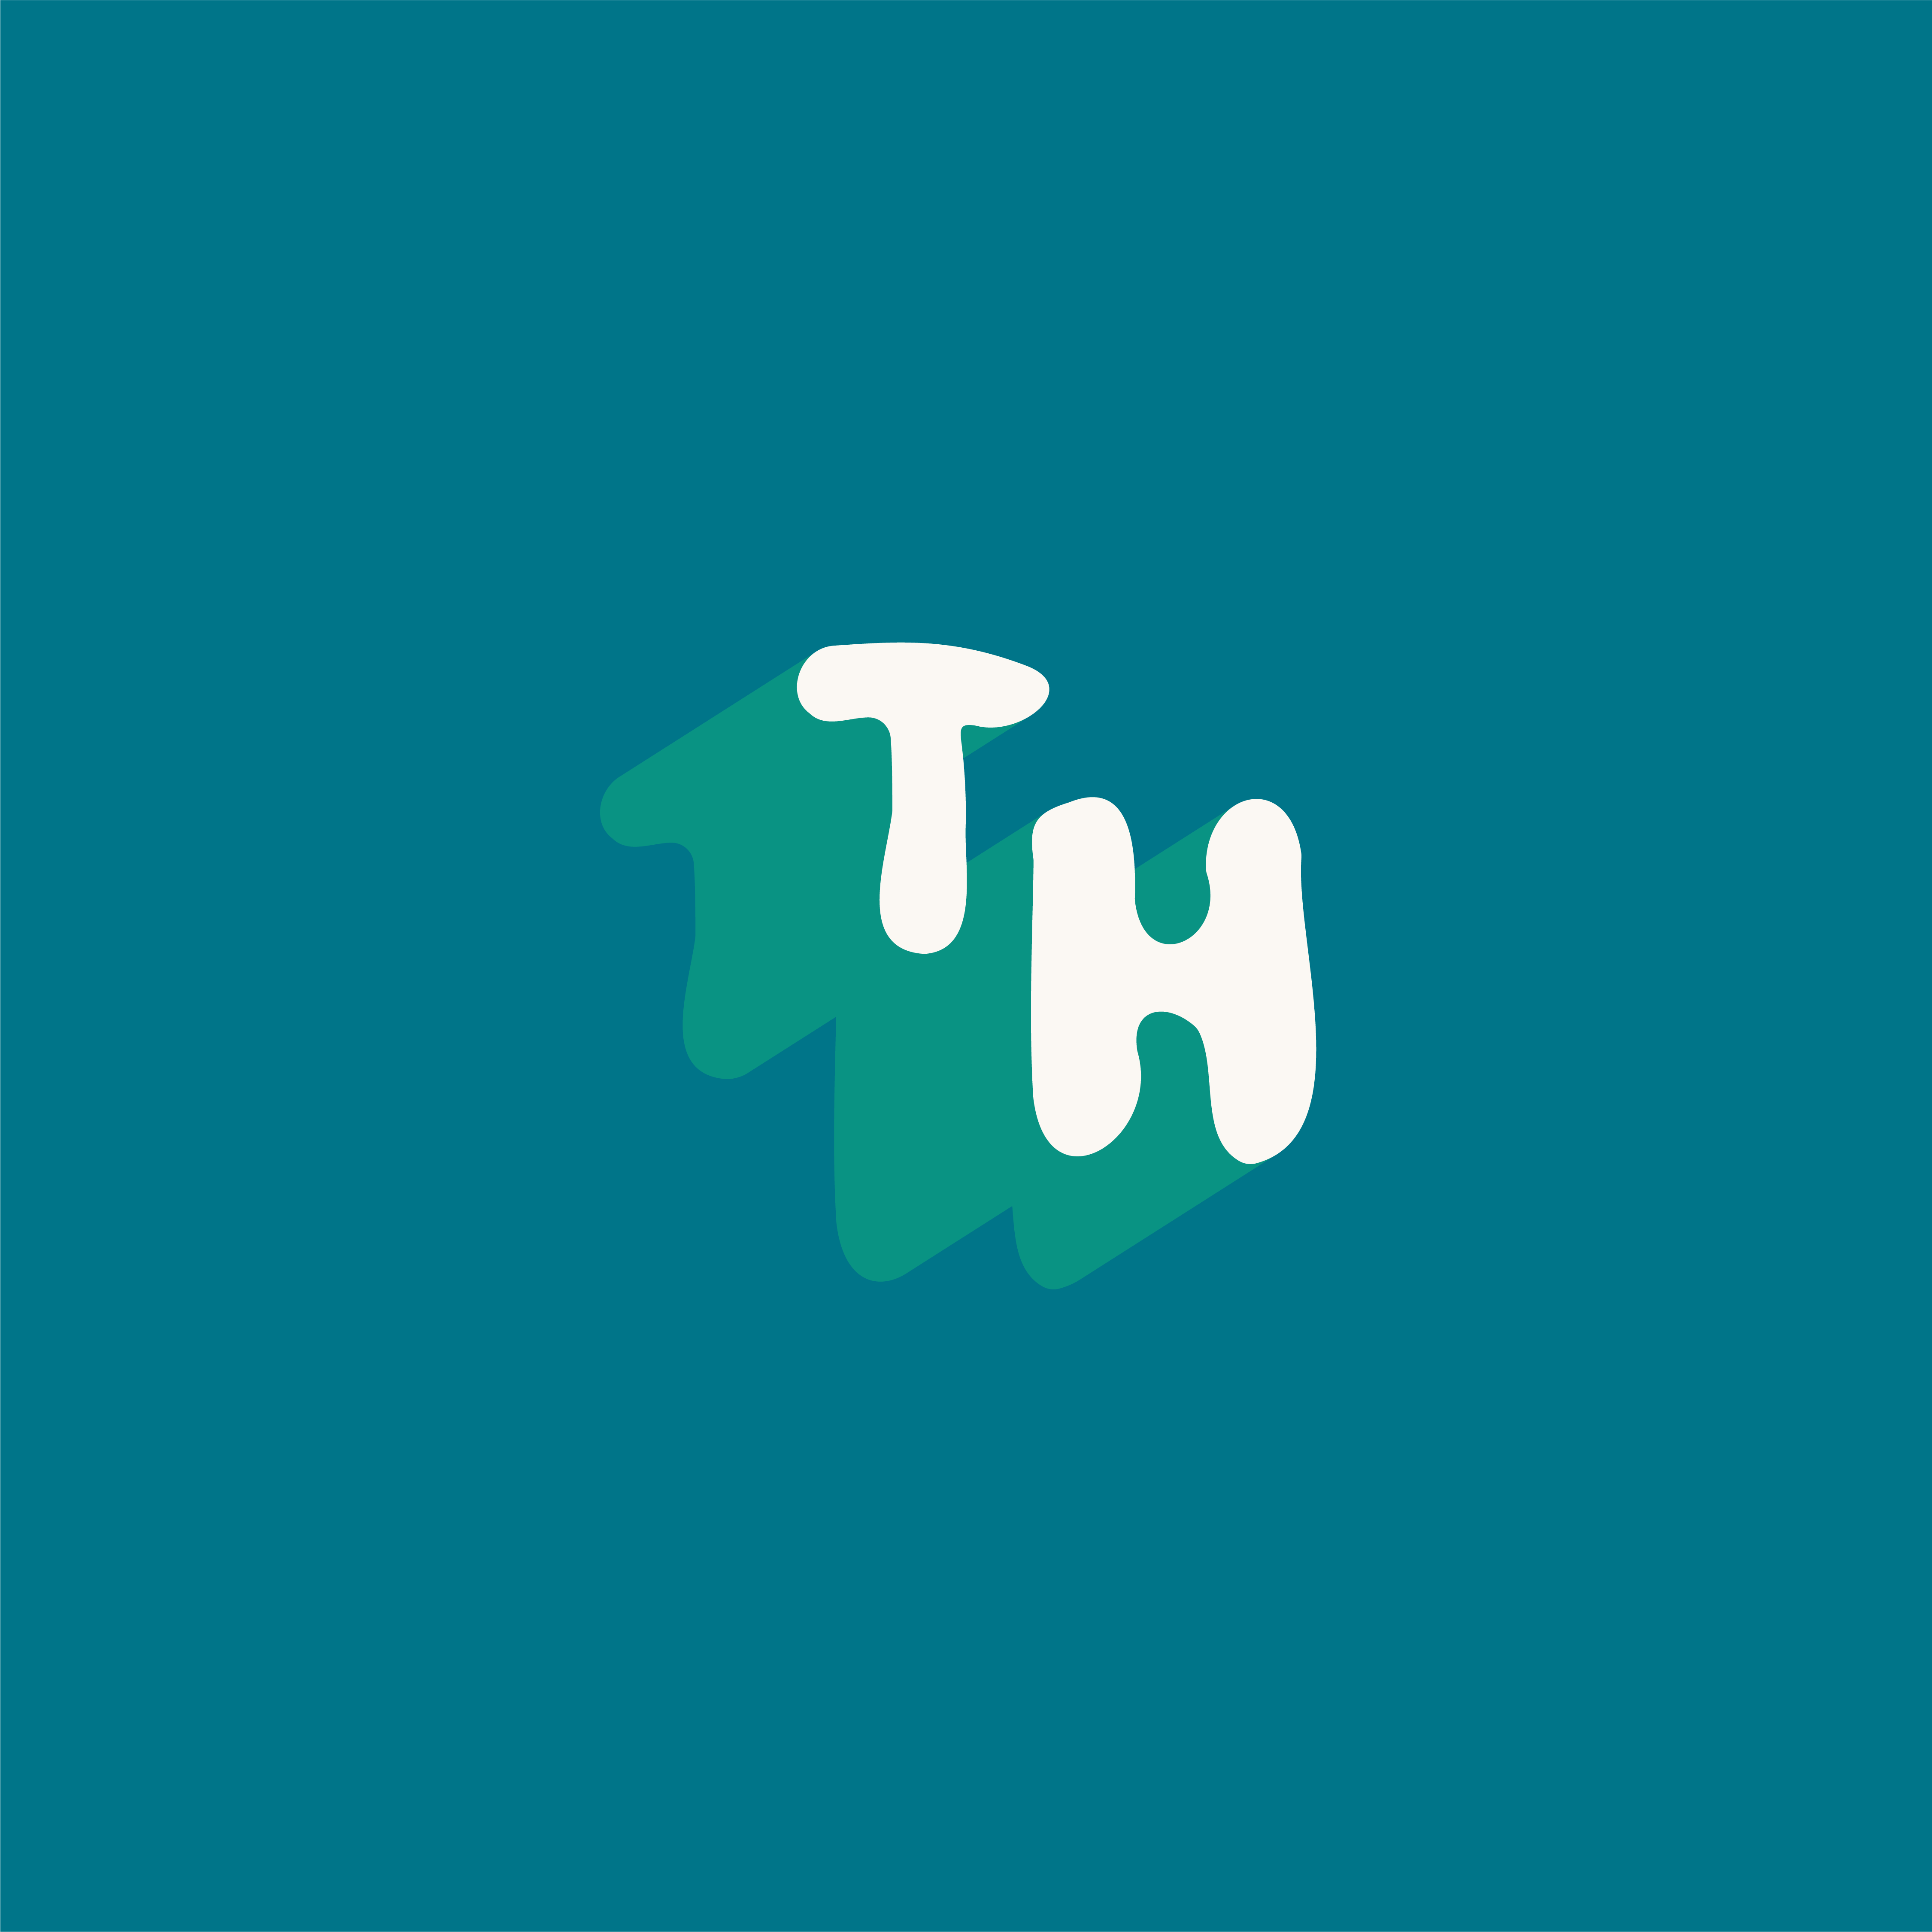 TH_Primary_Dark_Icon